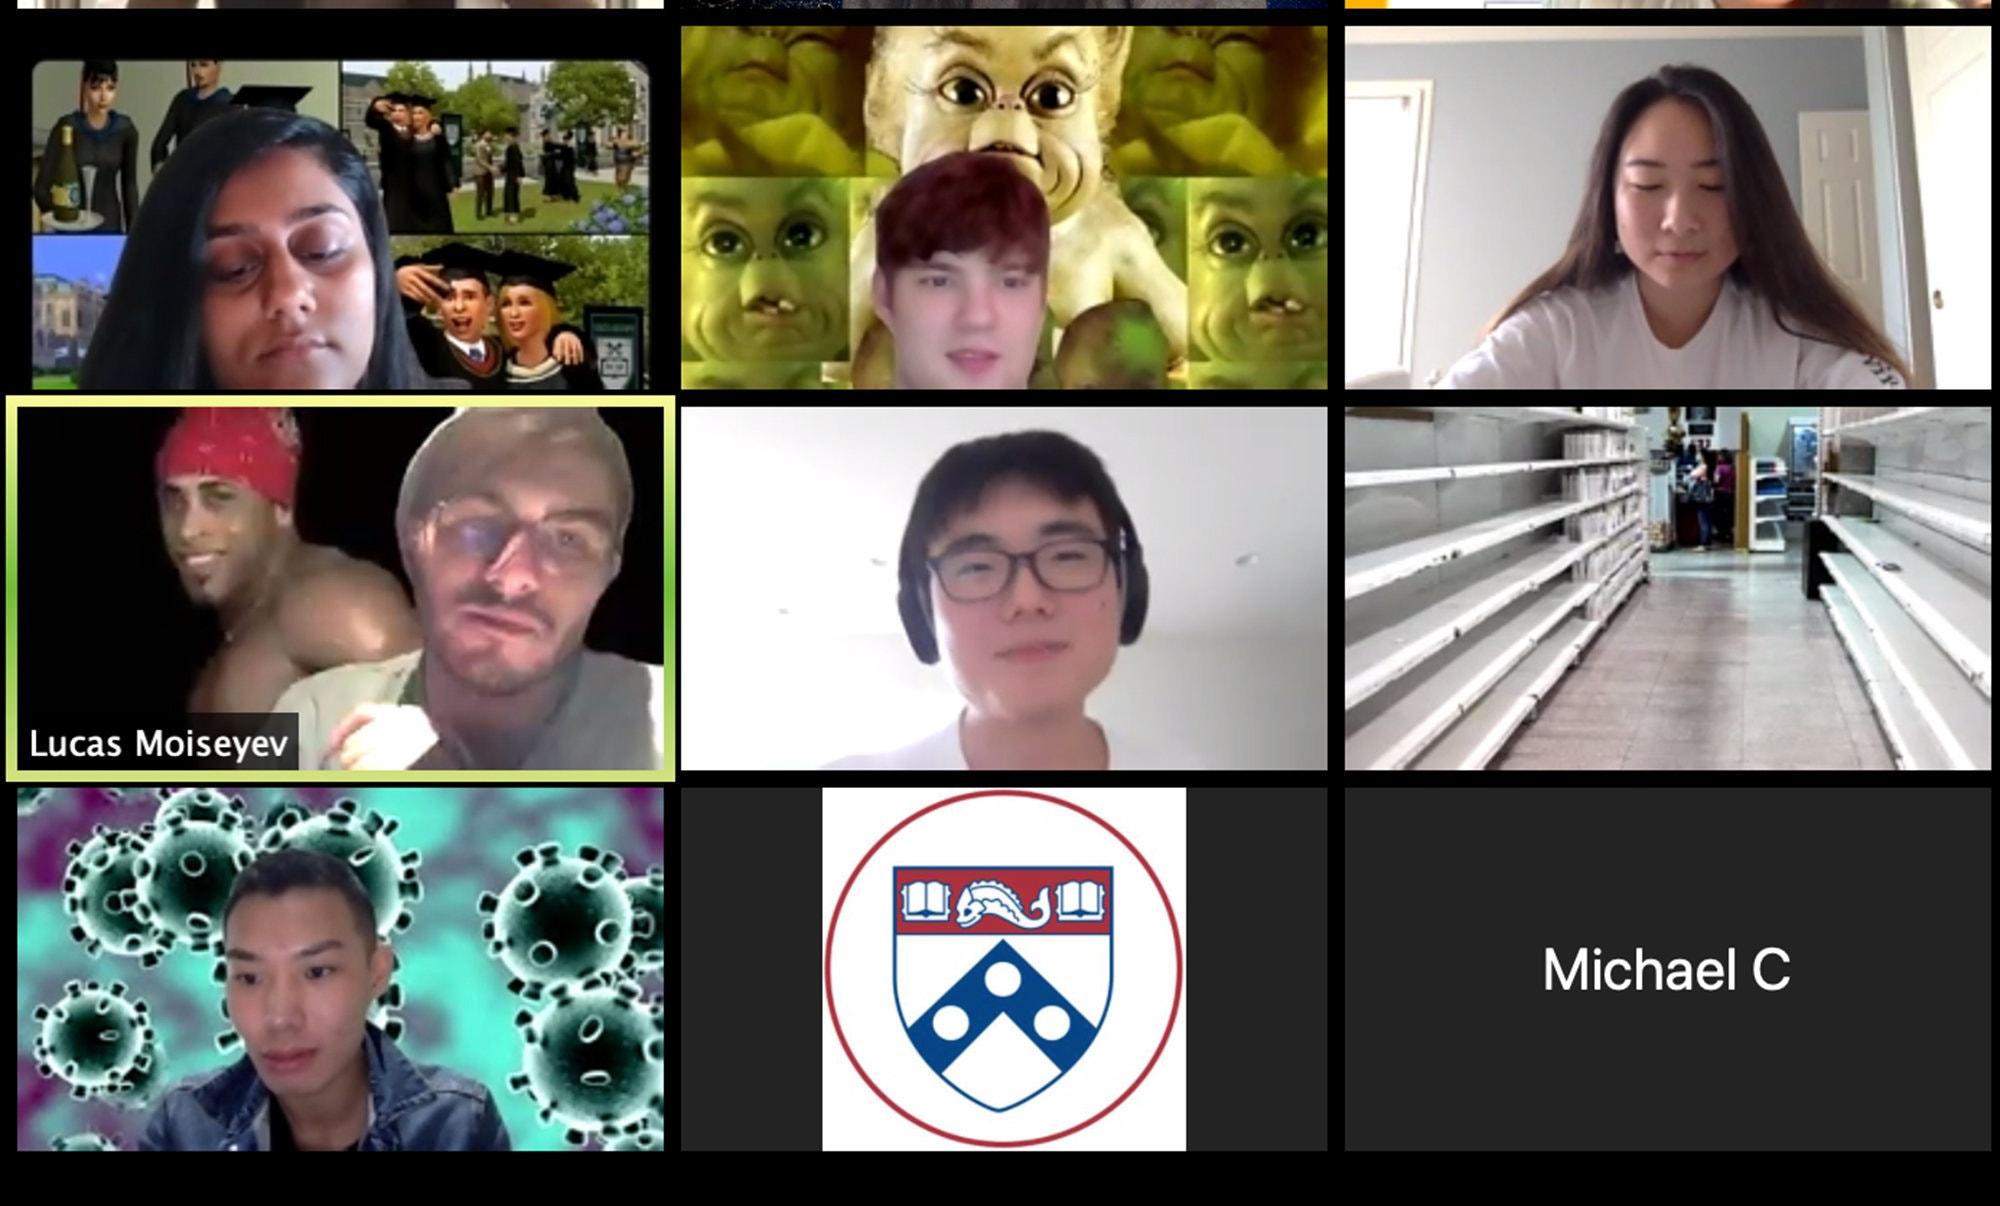 Jitsi Meet: опенсорсная альтернатива «шпионскому» видеоприложению Zoom - 4